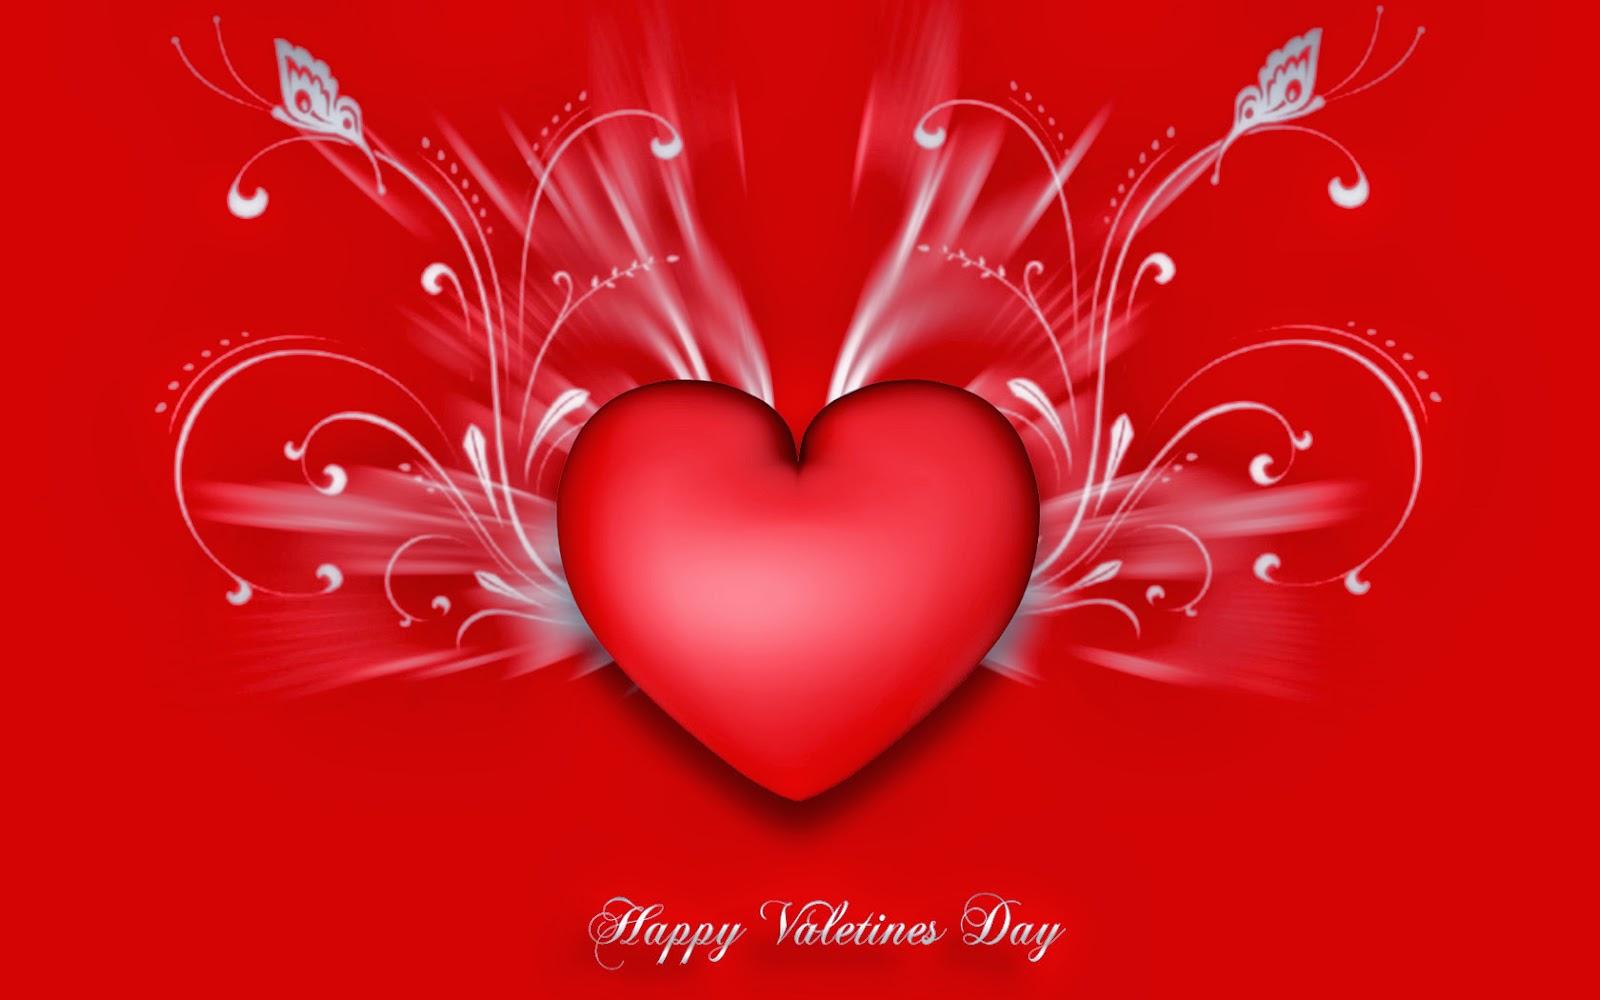 Free Valentine Desktop Backgrounds - WallpaperSafari